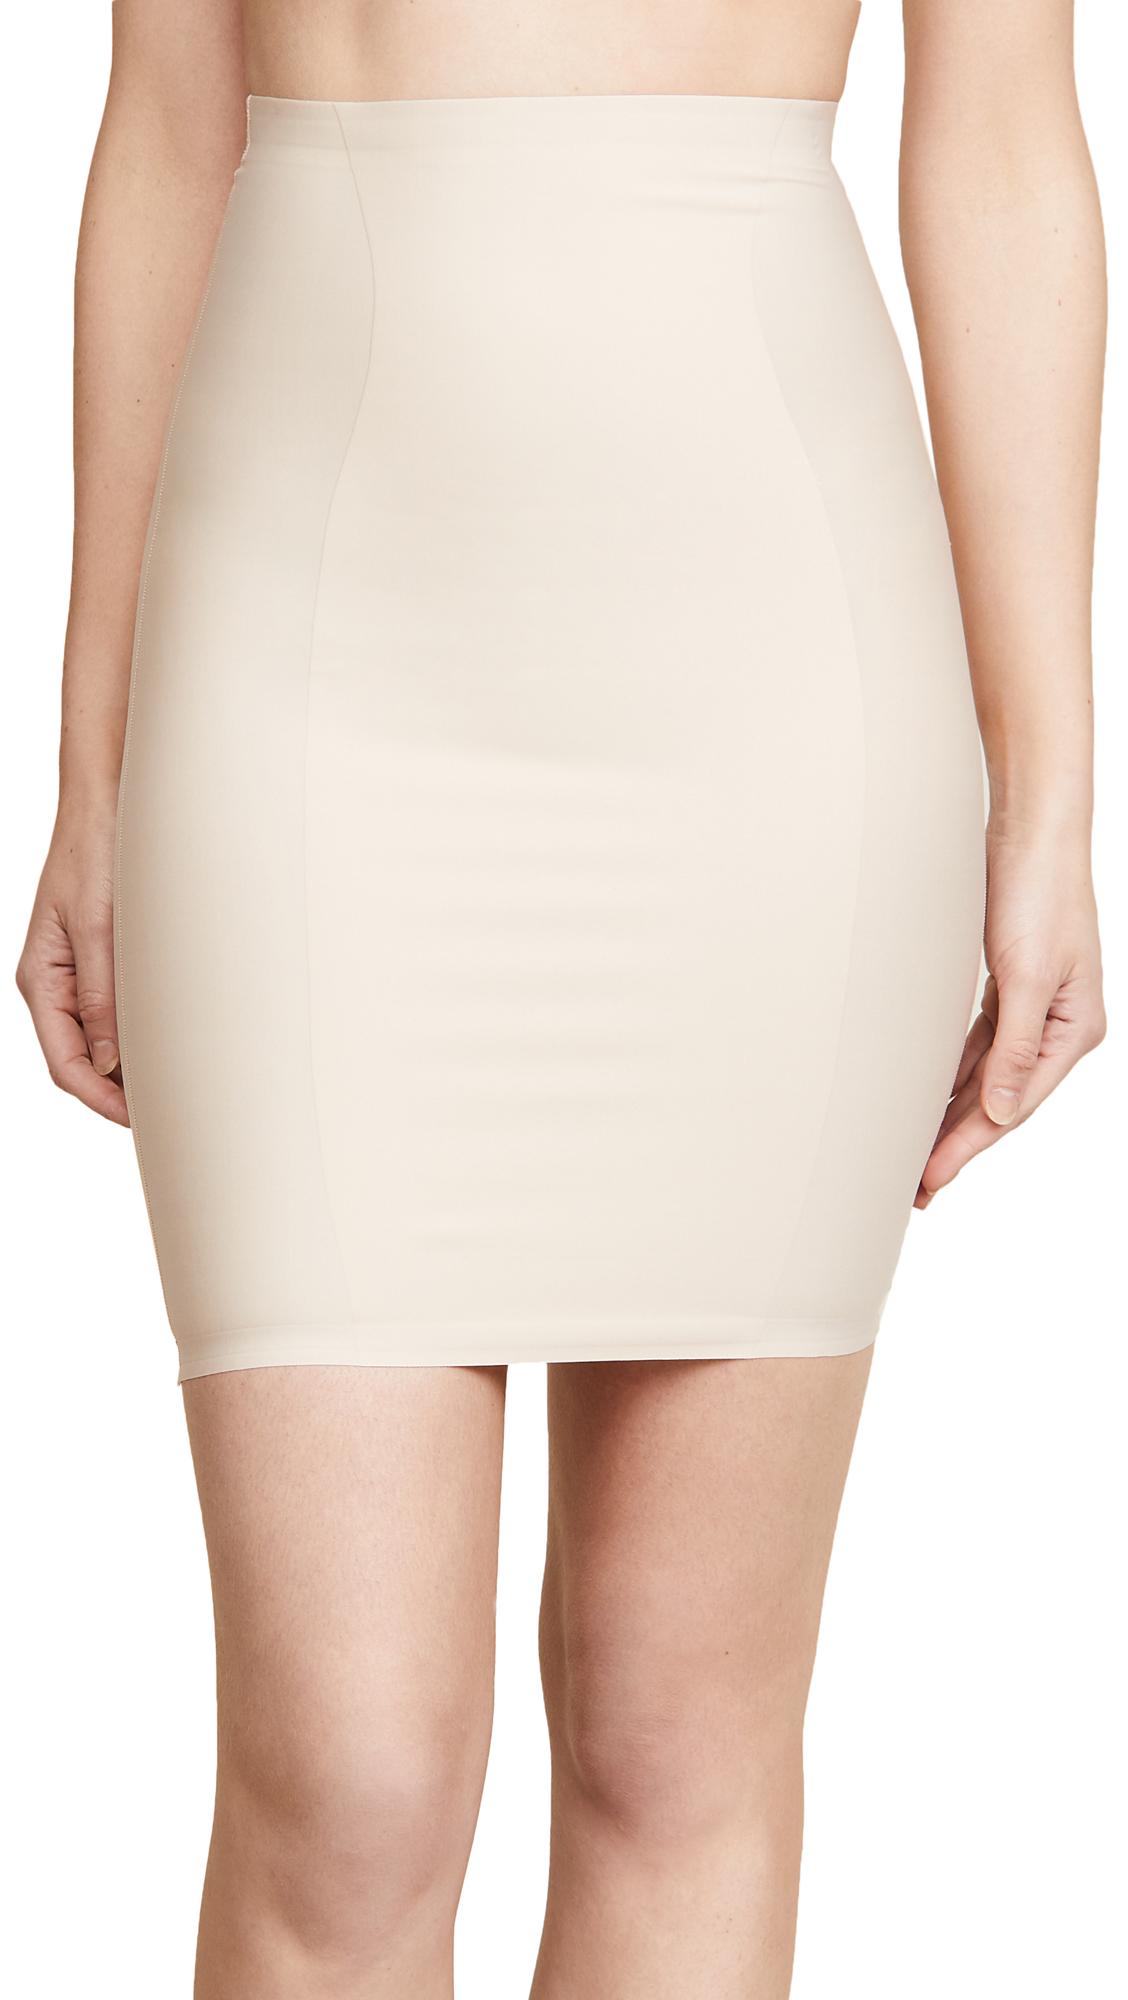 Yummie High Waist Skirt Slip In Frappe